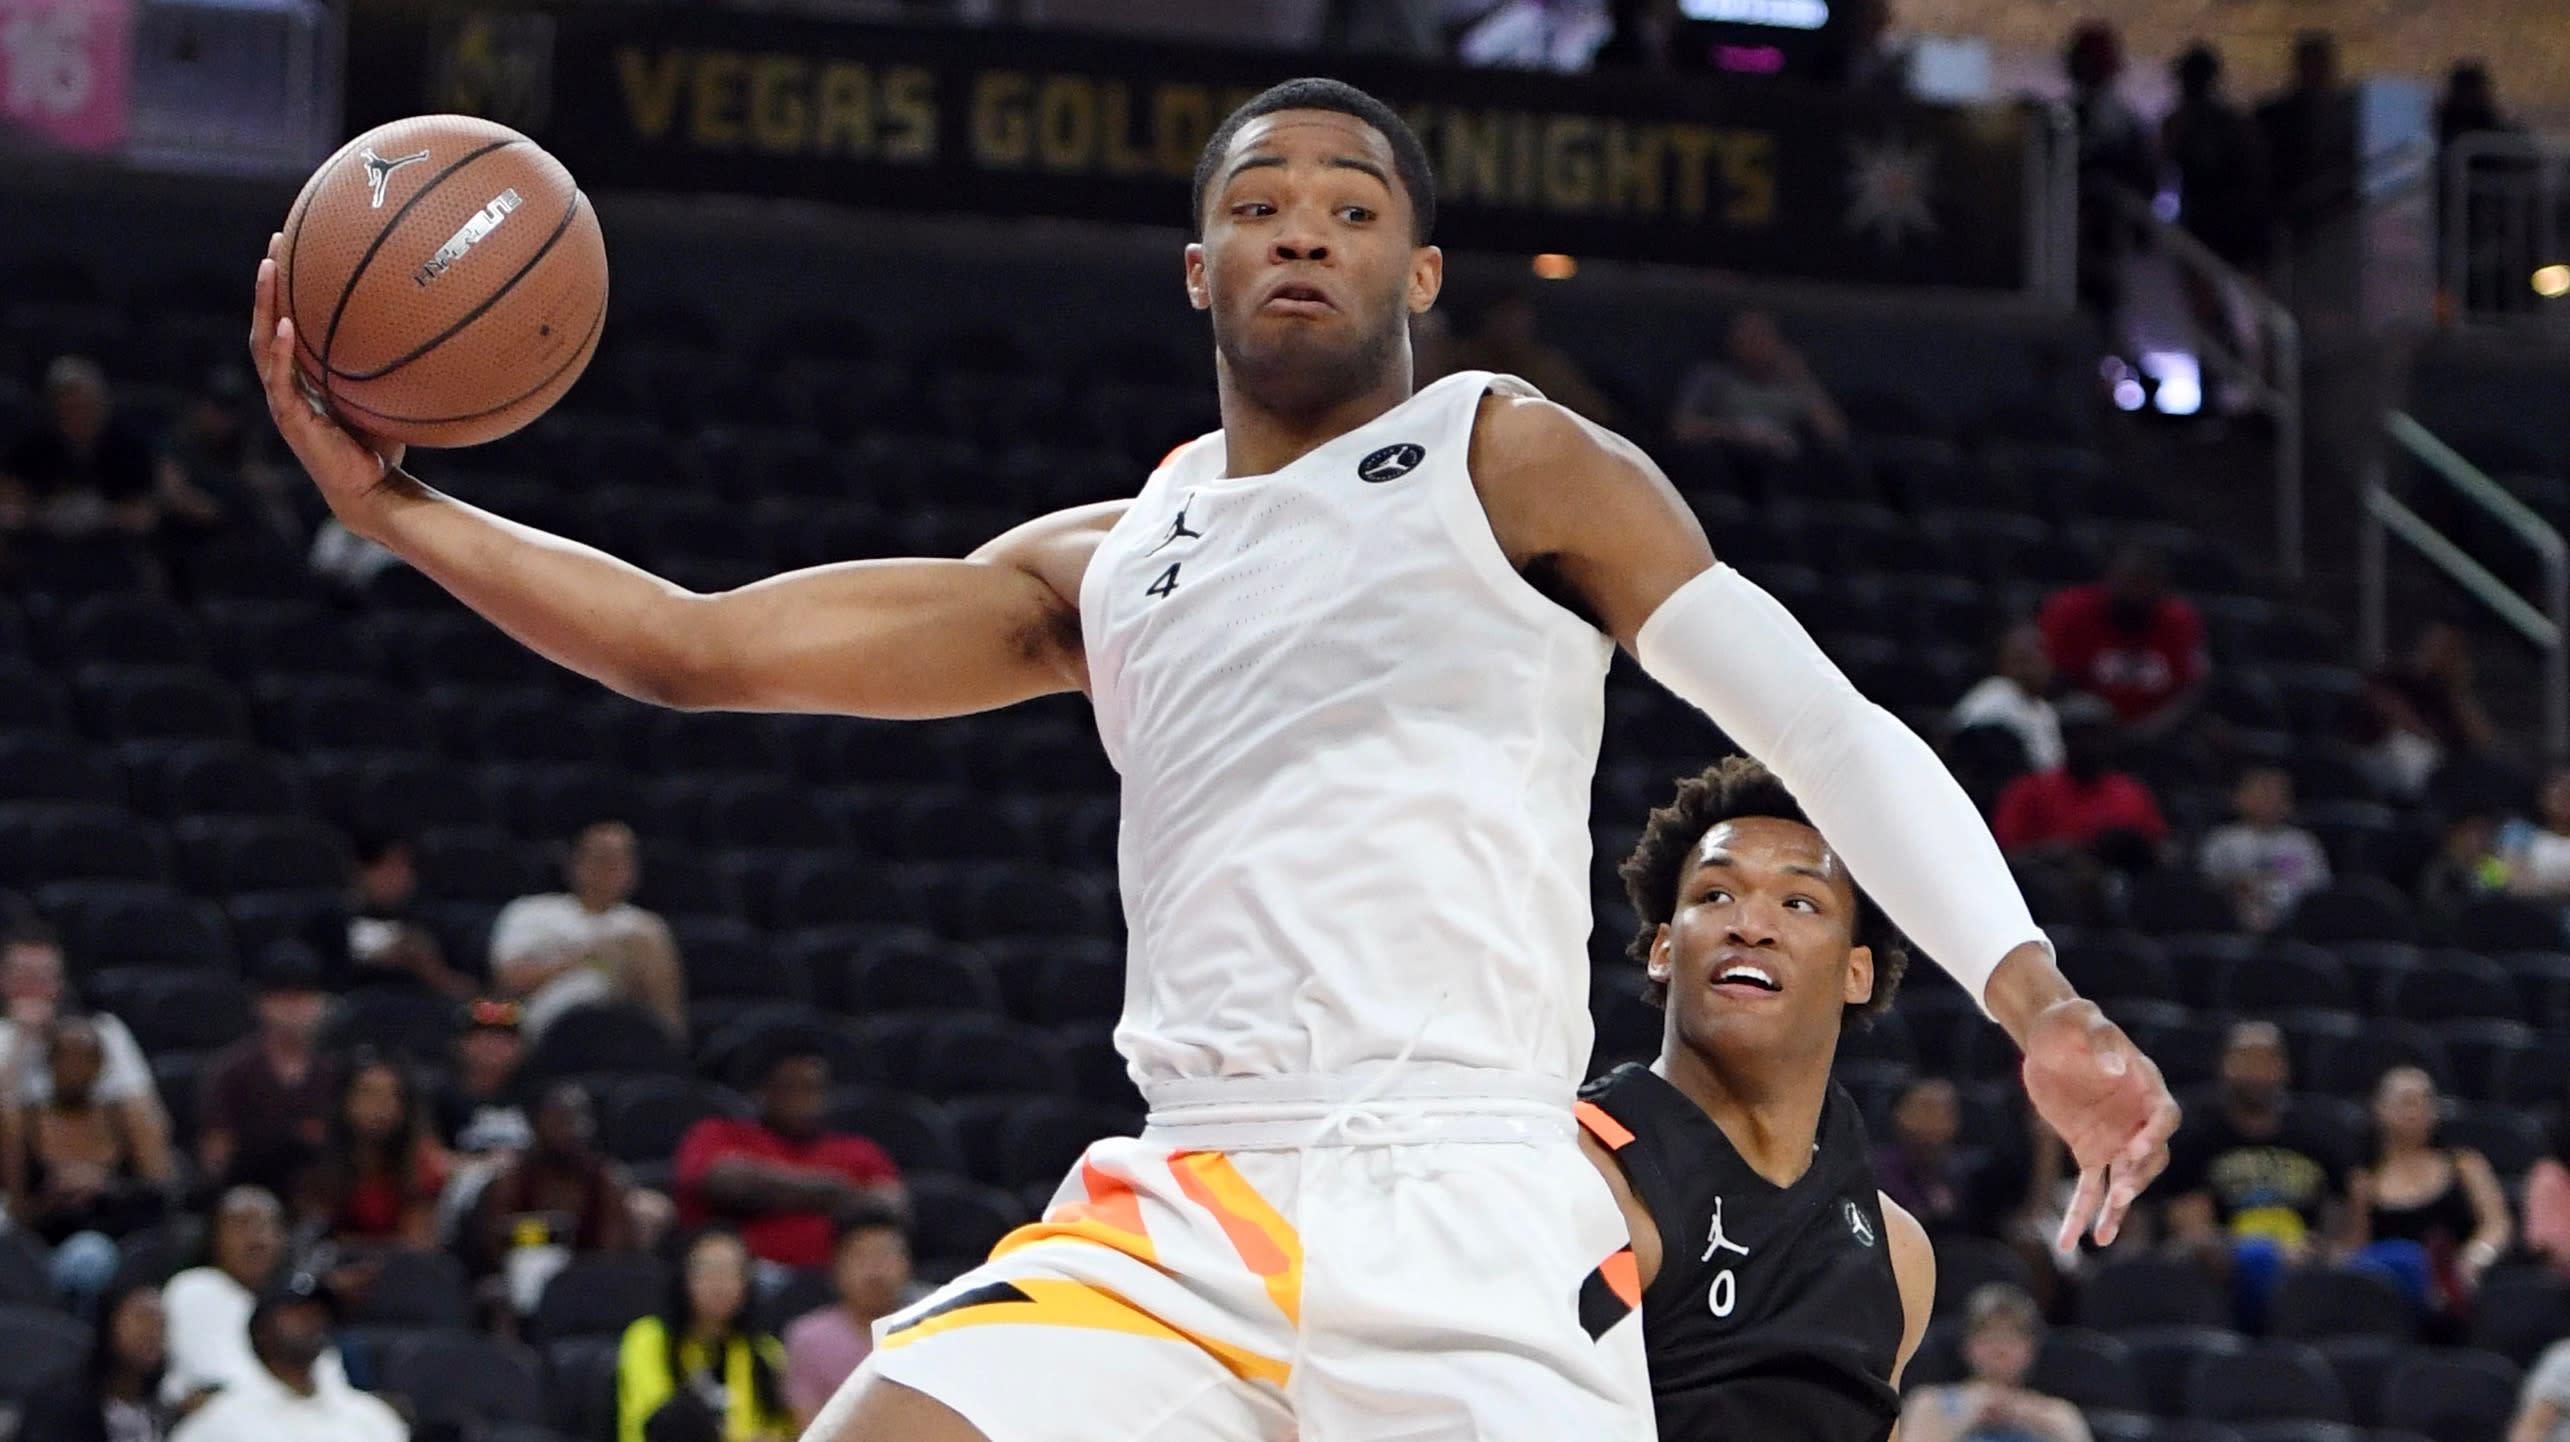 Duke says incoming freshman jumps higher than Zion Williamson